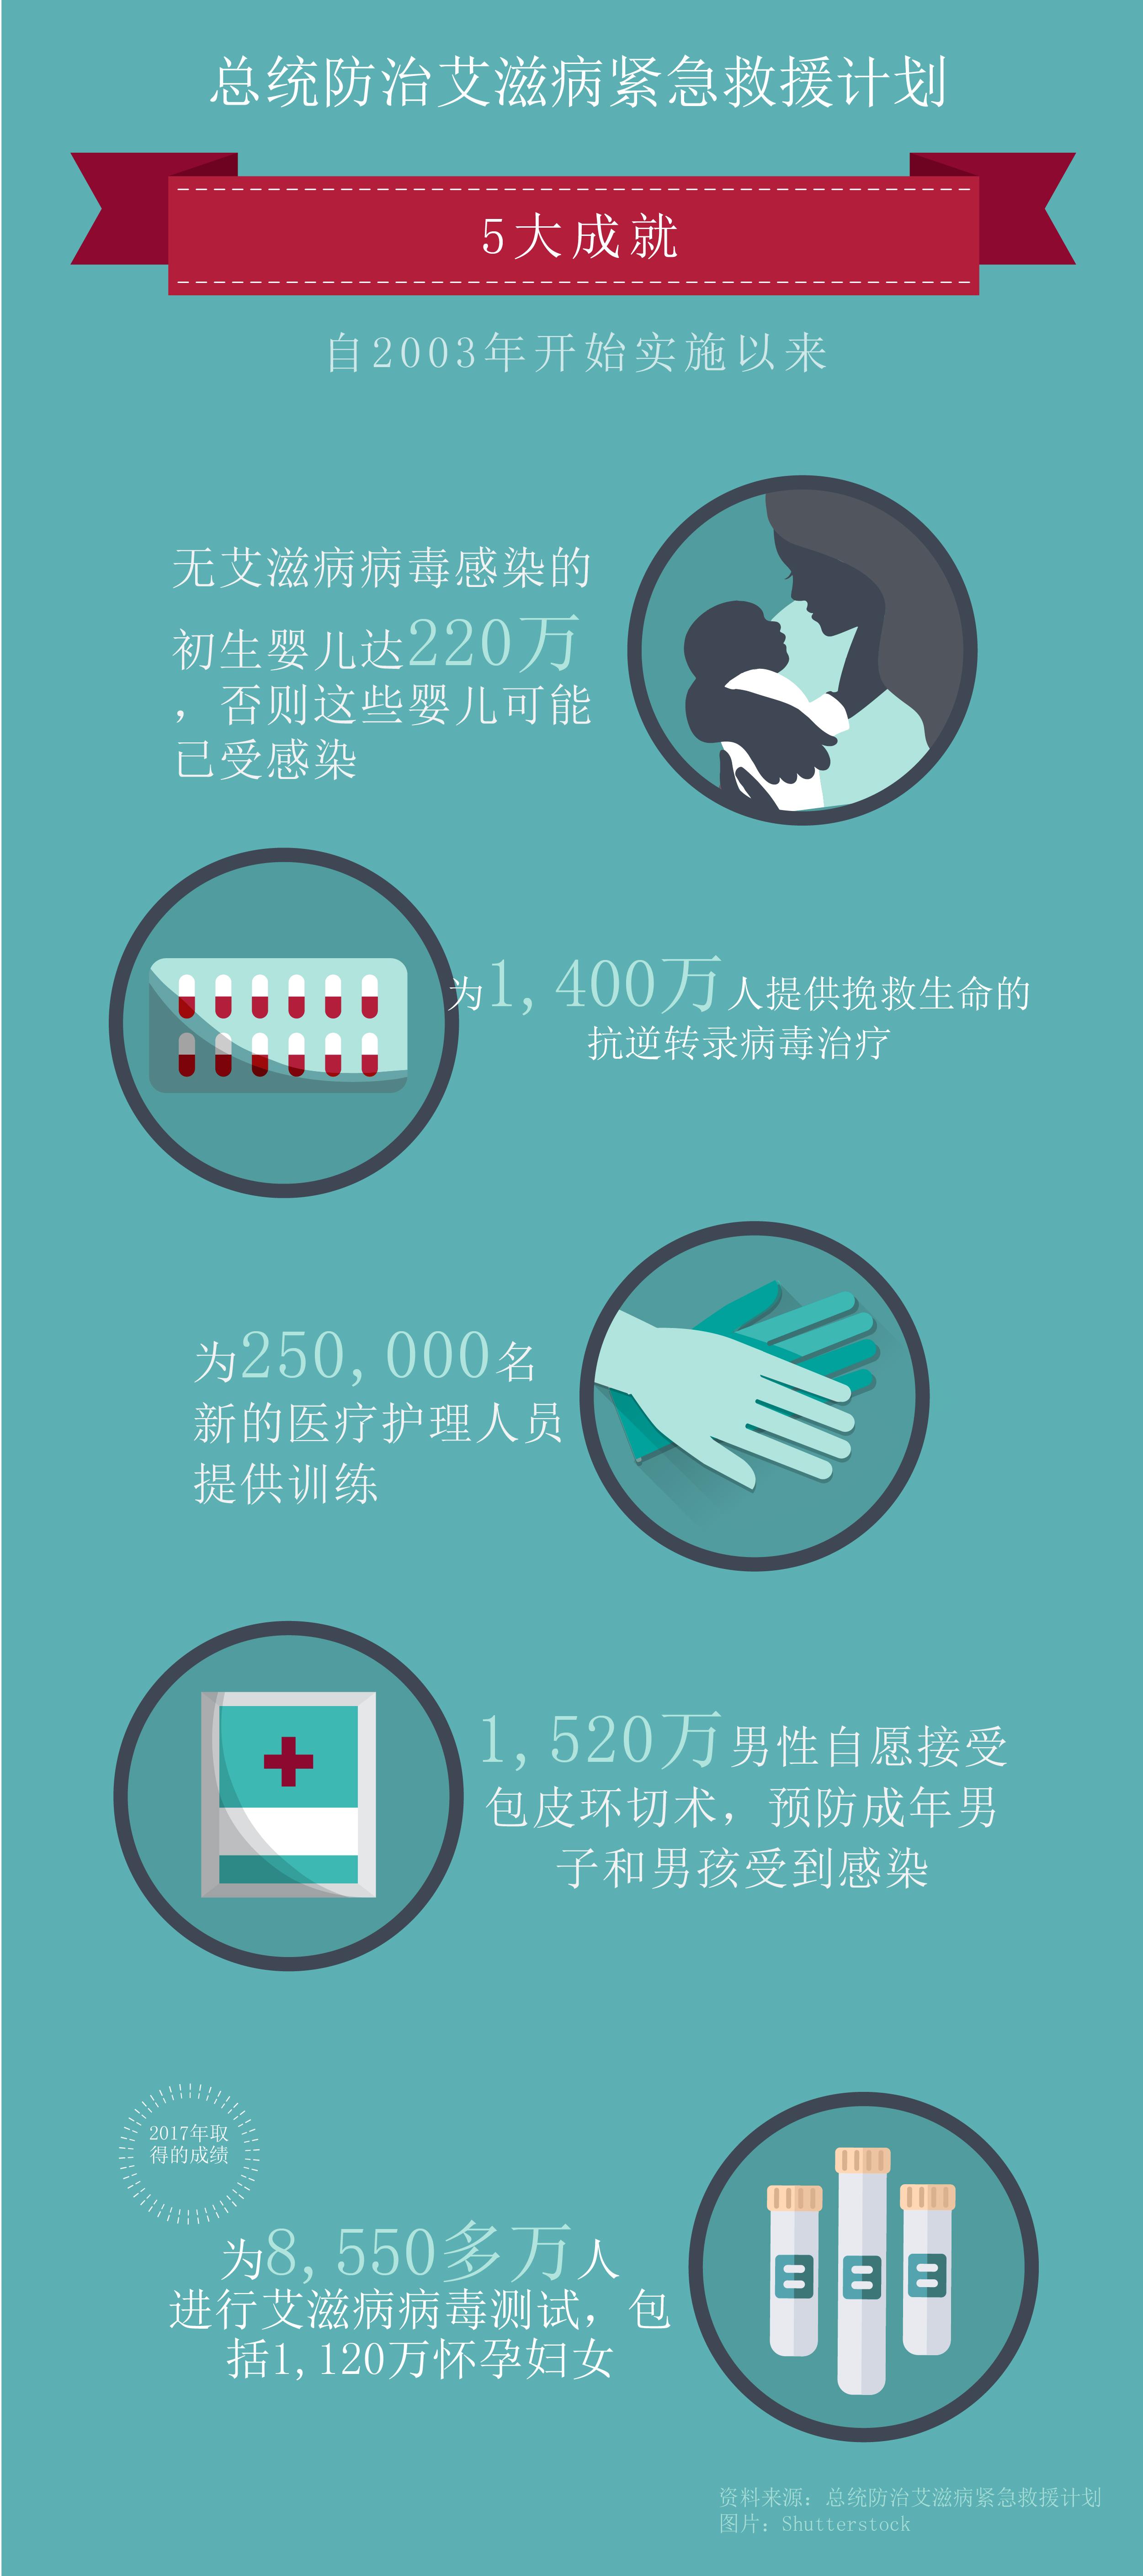 Chart listing PEPFAR's top five successes, with illustrations (State Dept./J. Maruszewski)